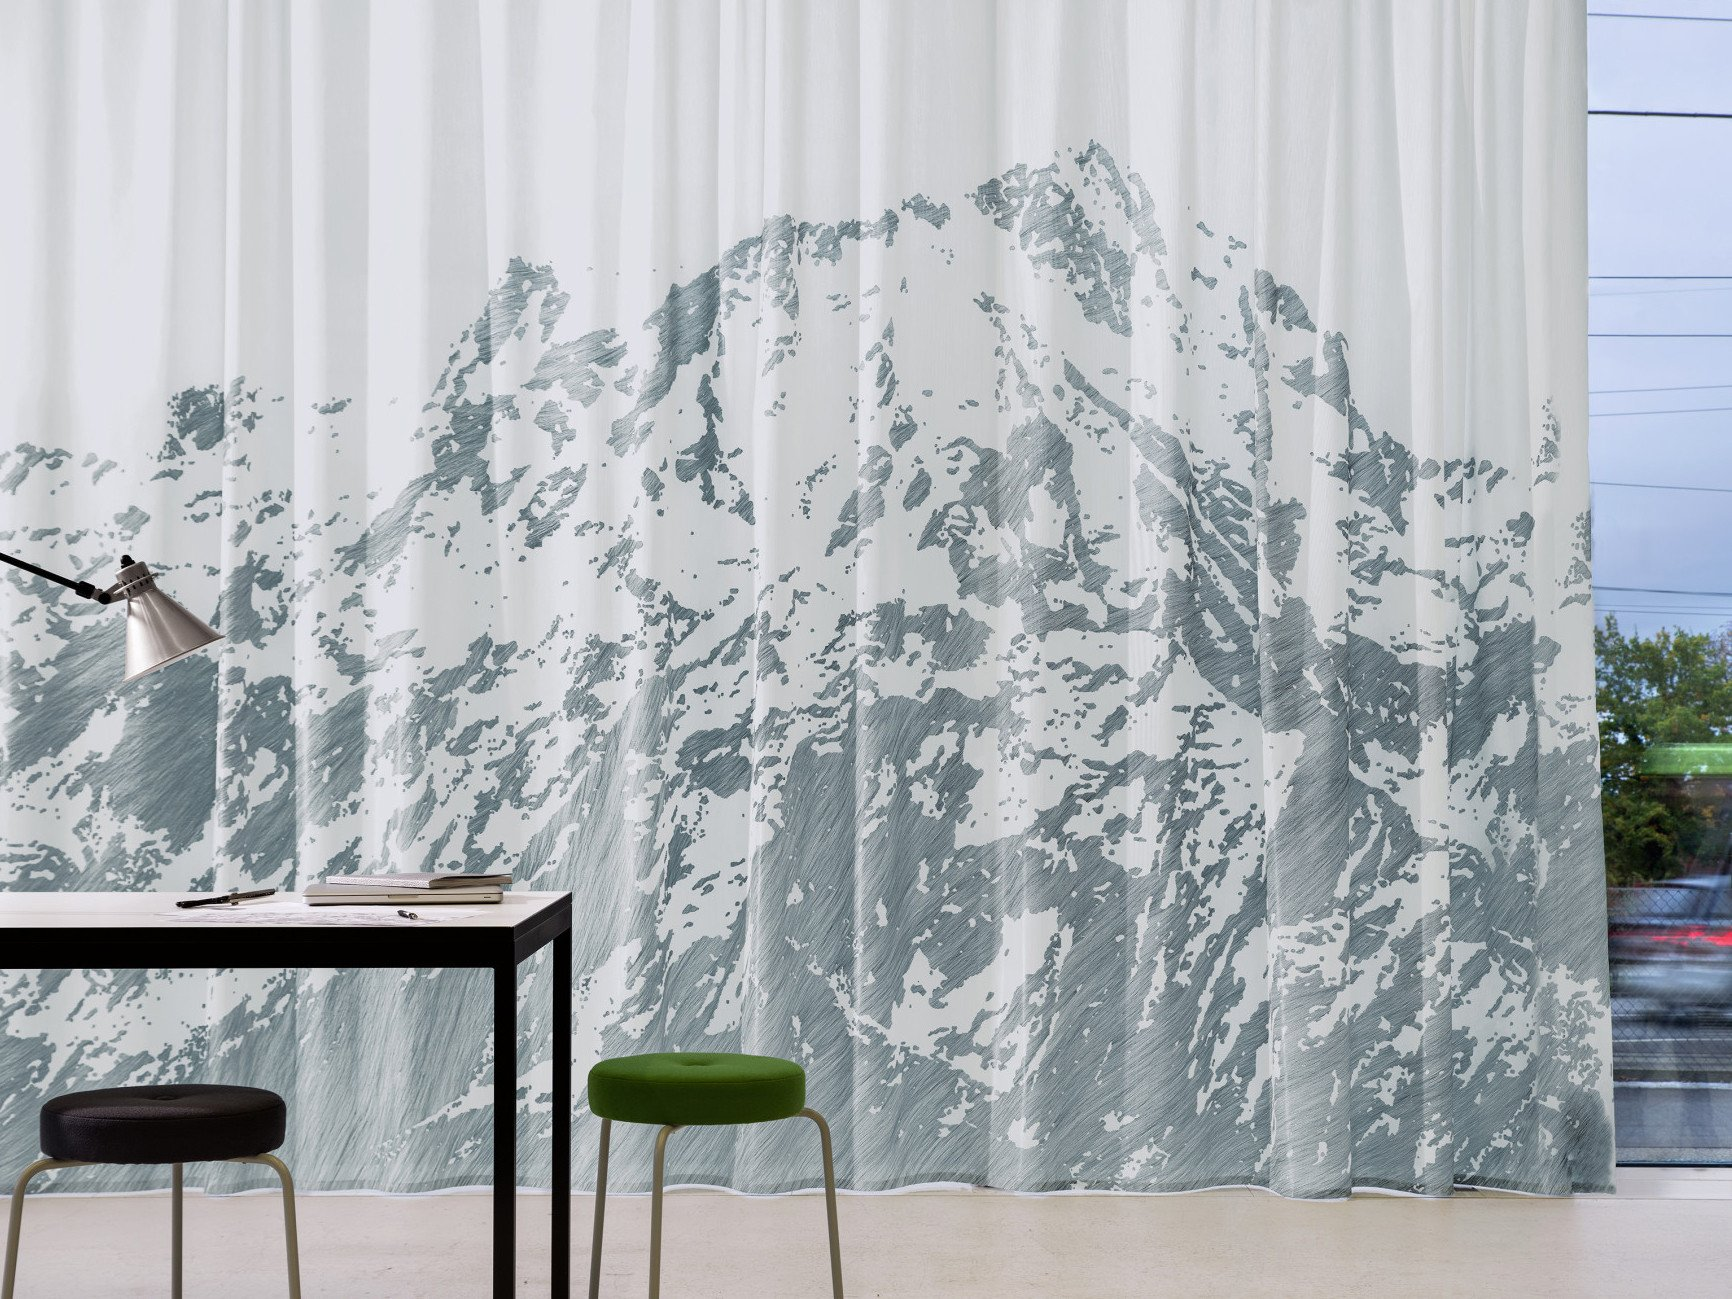 Vorhang Schallabsorbierend Dekoration : Transparente akustikvorhänge fürs büro akustik news produkte